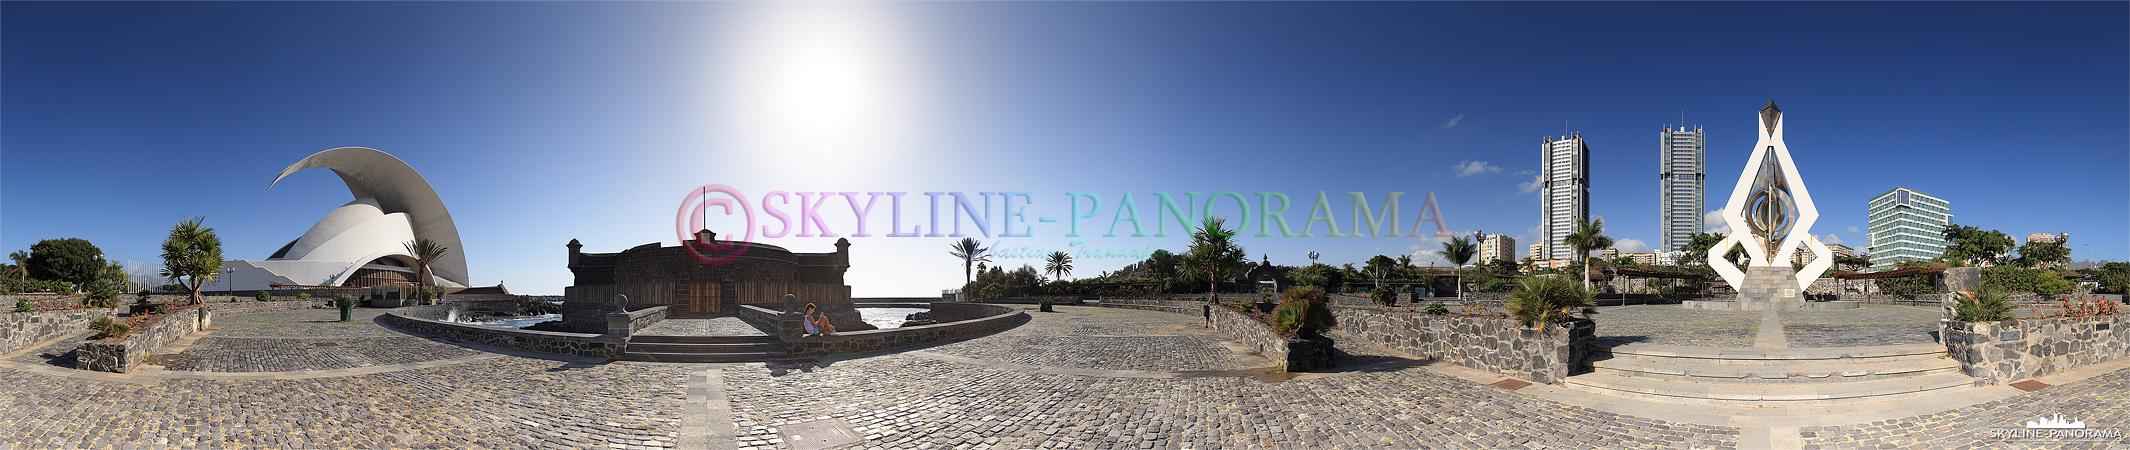 Bilder Santa Cruz - Das bekannte Auditorio de Tenerife und das historische Castello di San Juan Bautista als 360 Grad Panorama am Tag fotografiert.